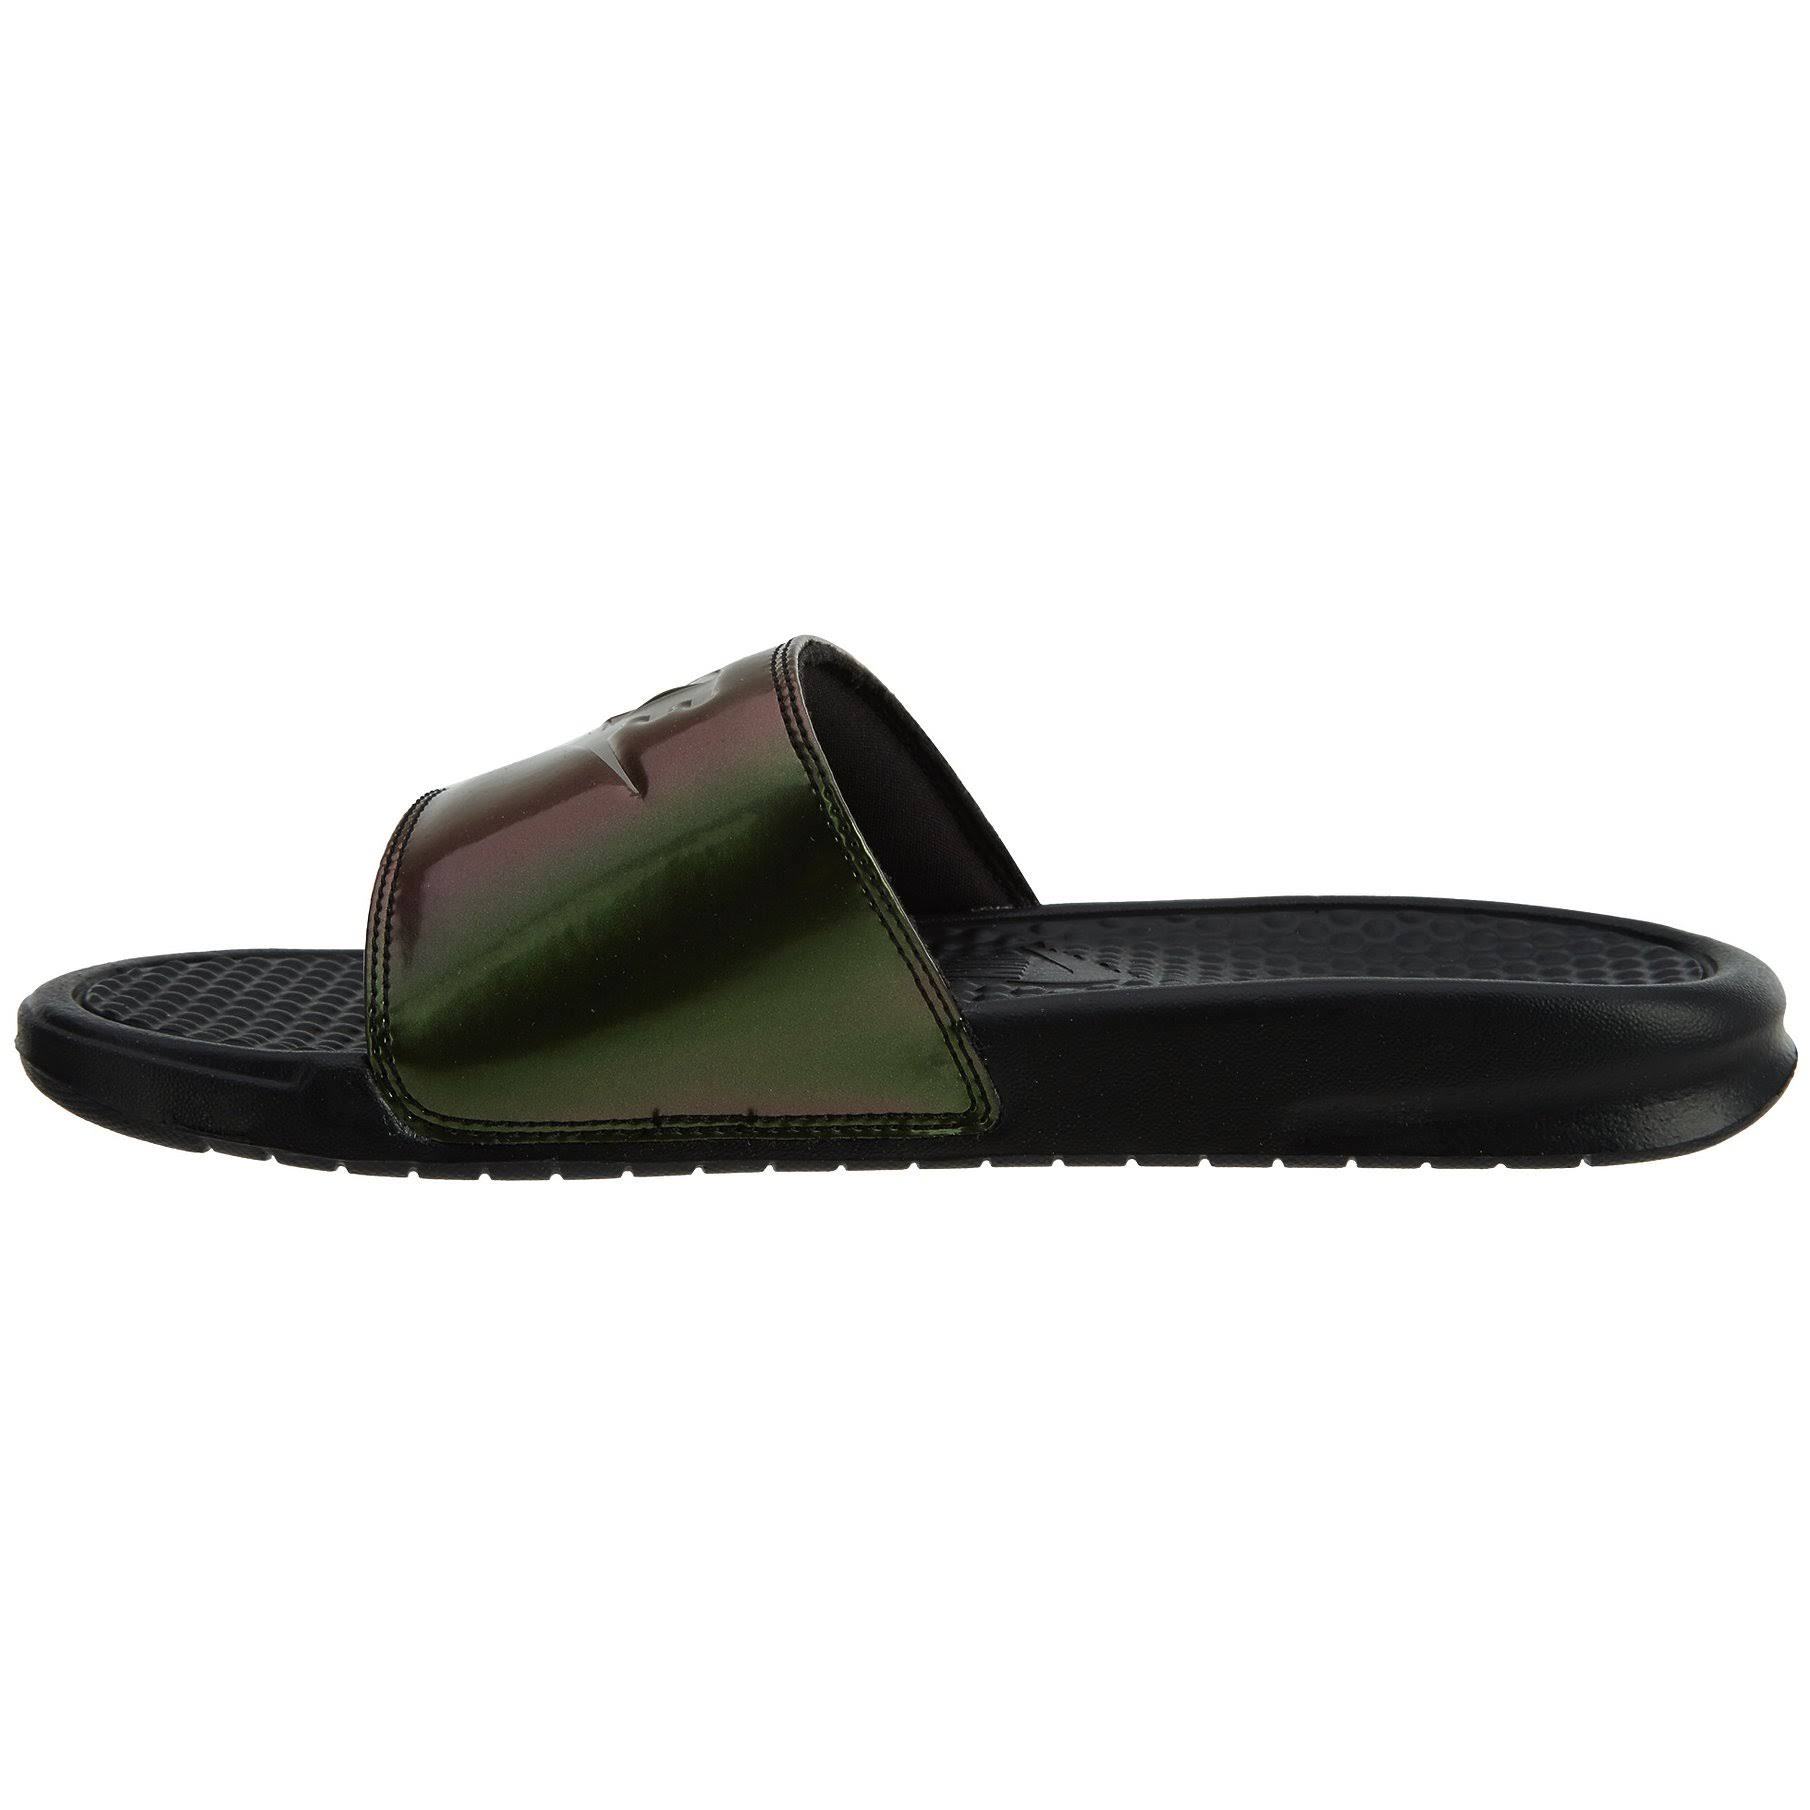 Sandals Slide 618919 Print Noir Benassi Femmes 012 Nike Jdi gPqwxT6R